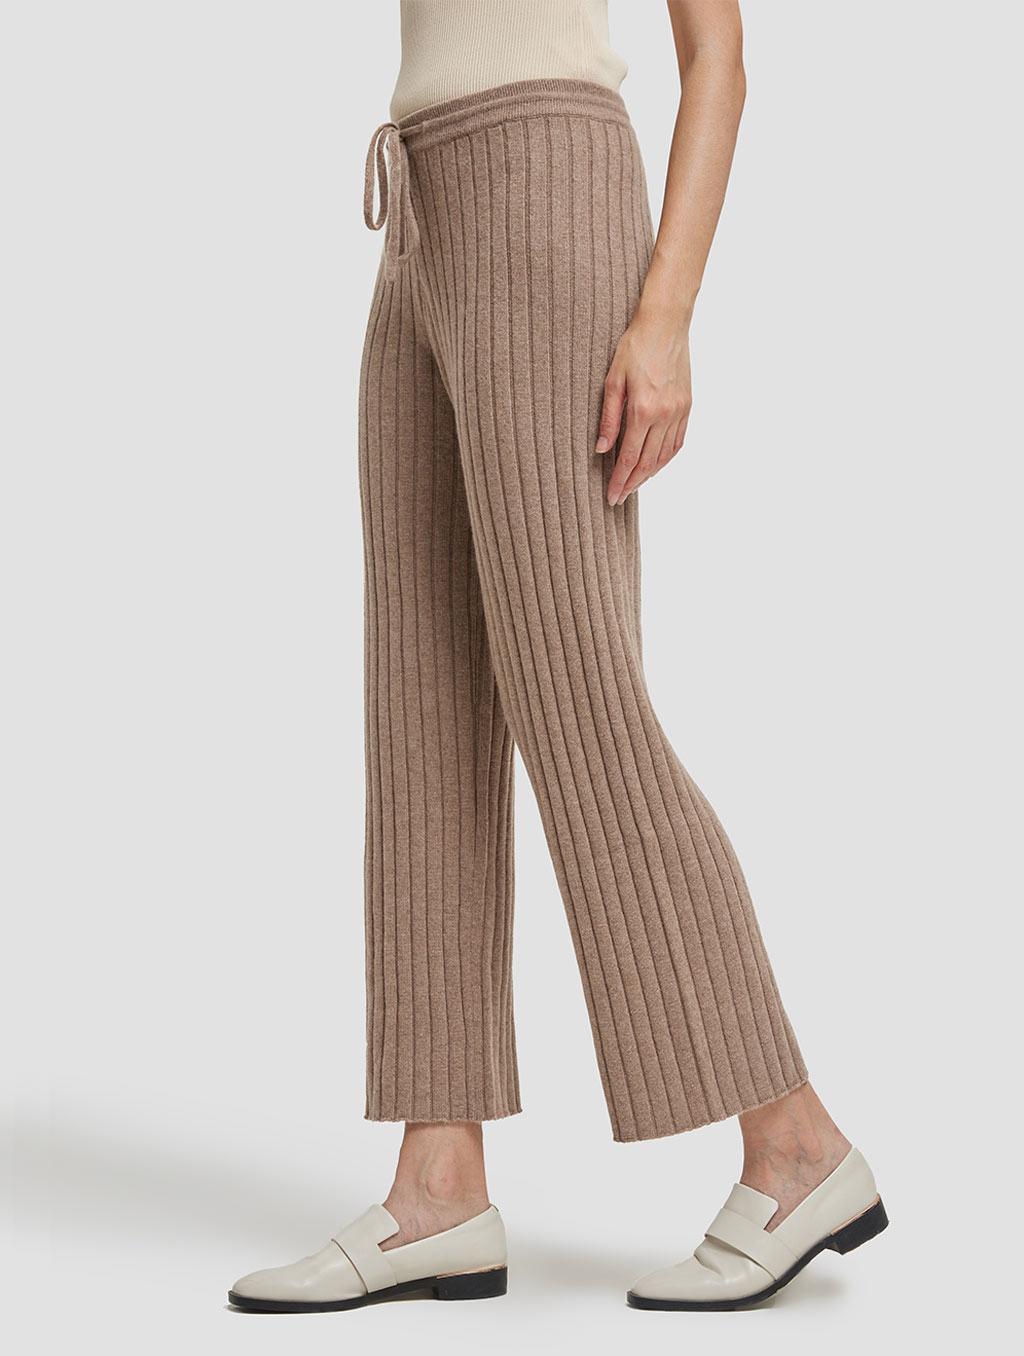 Slim fit casual cashmere pants-side-khaki